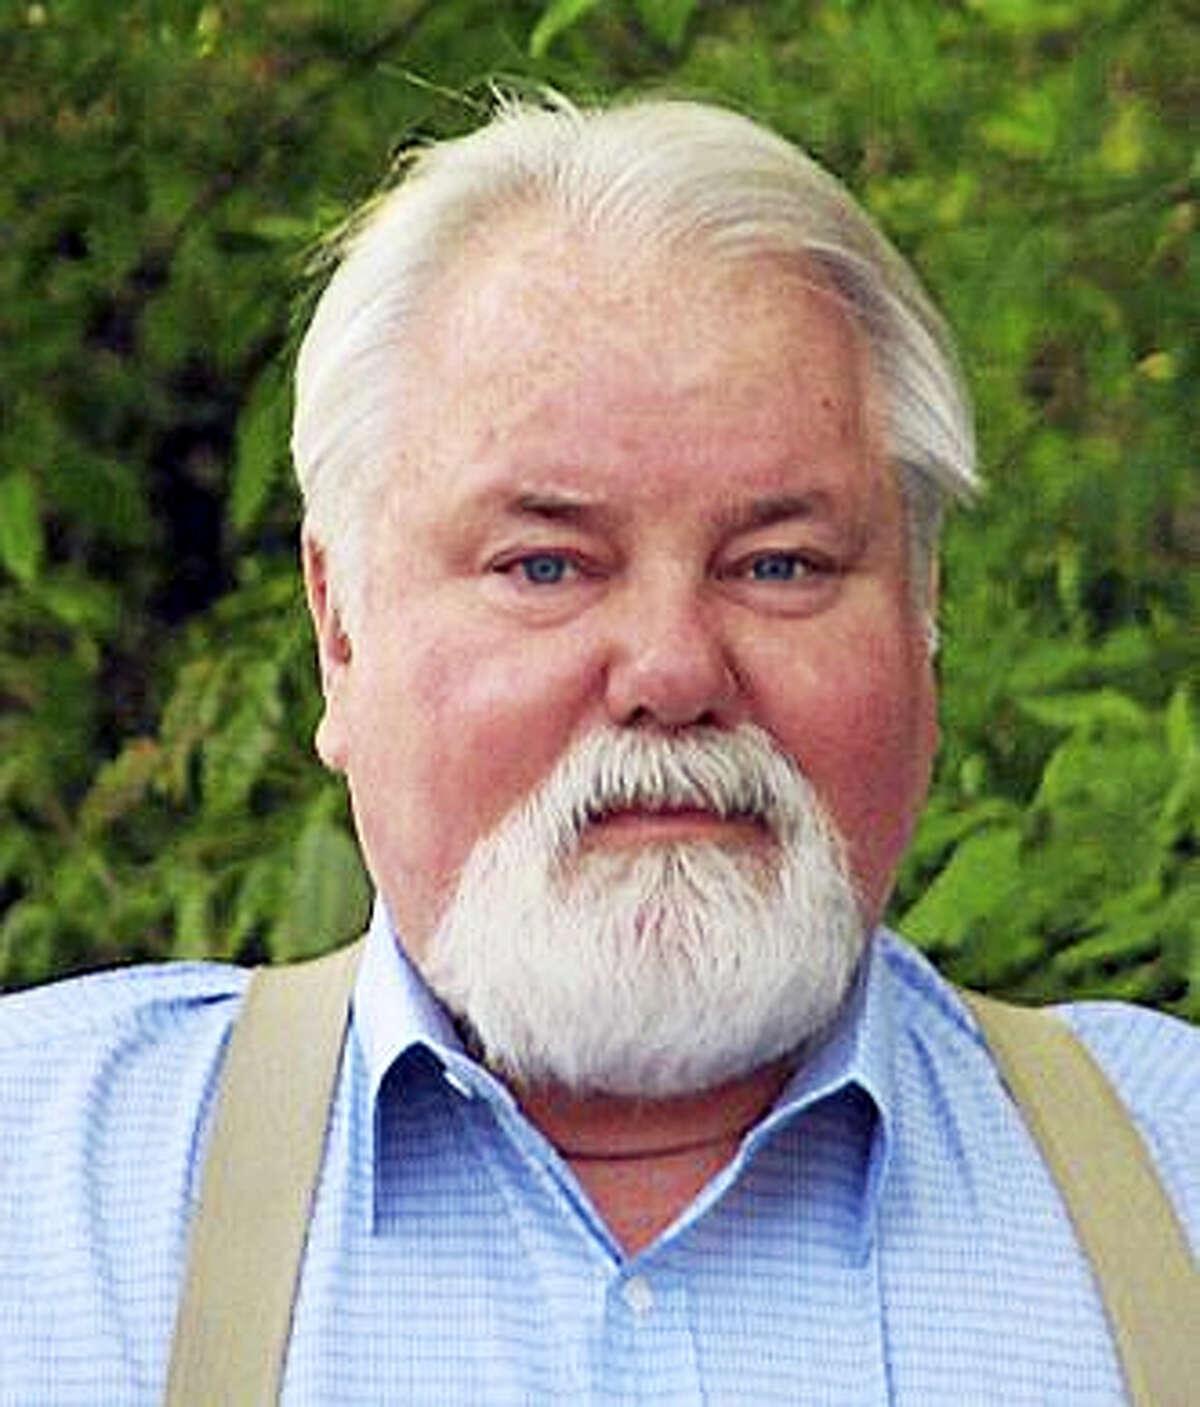 Portland Selectman Carl Chudzik died Monday at age 63.